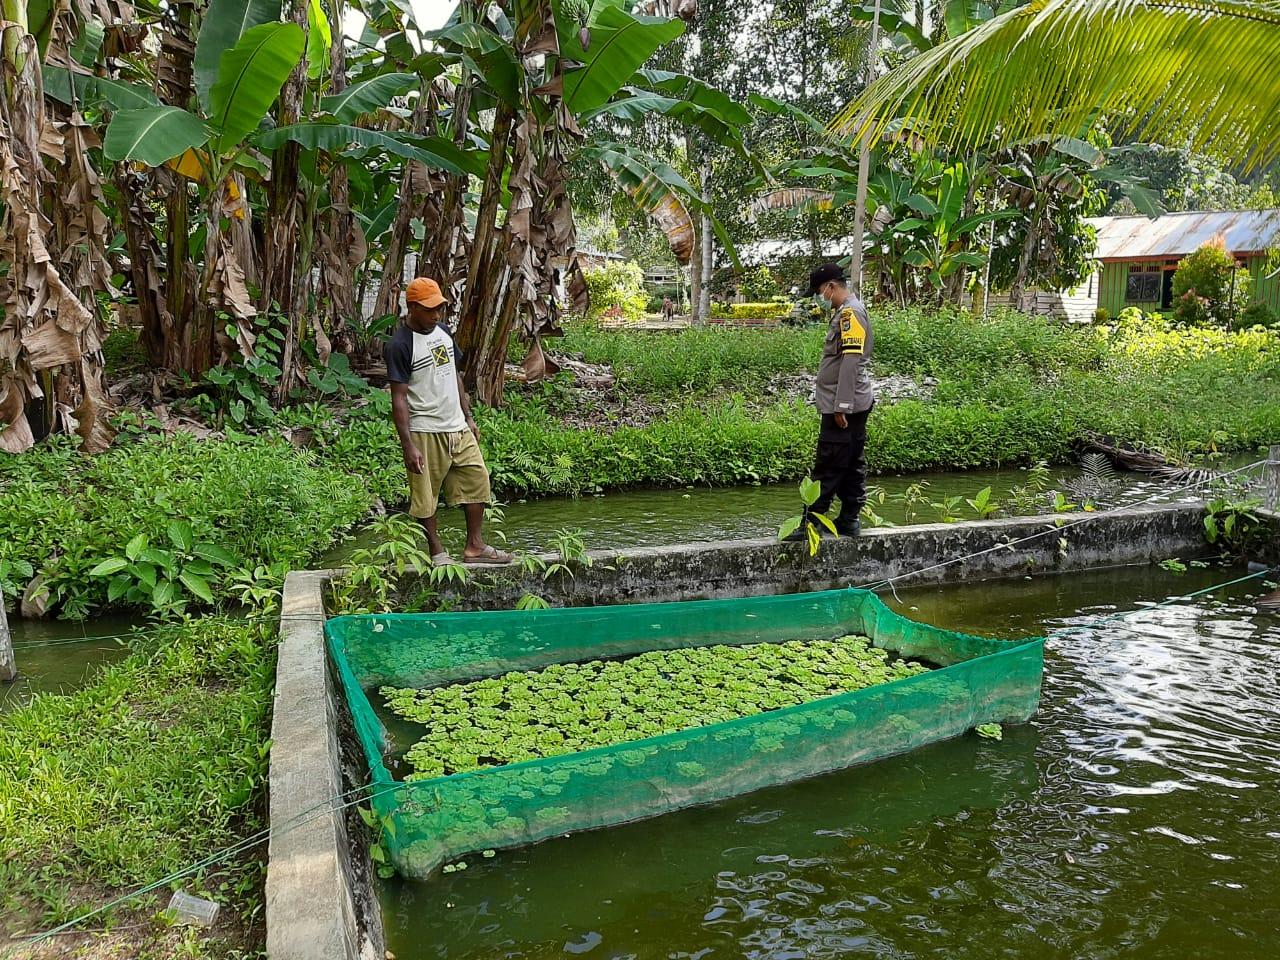 Bhabinkamtibmas Polsek Sausapor Monitoring Program Ketahanan Pangan Budidaya Ikan Air Tawar